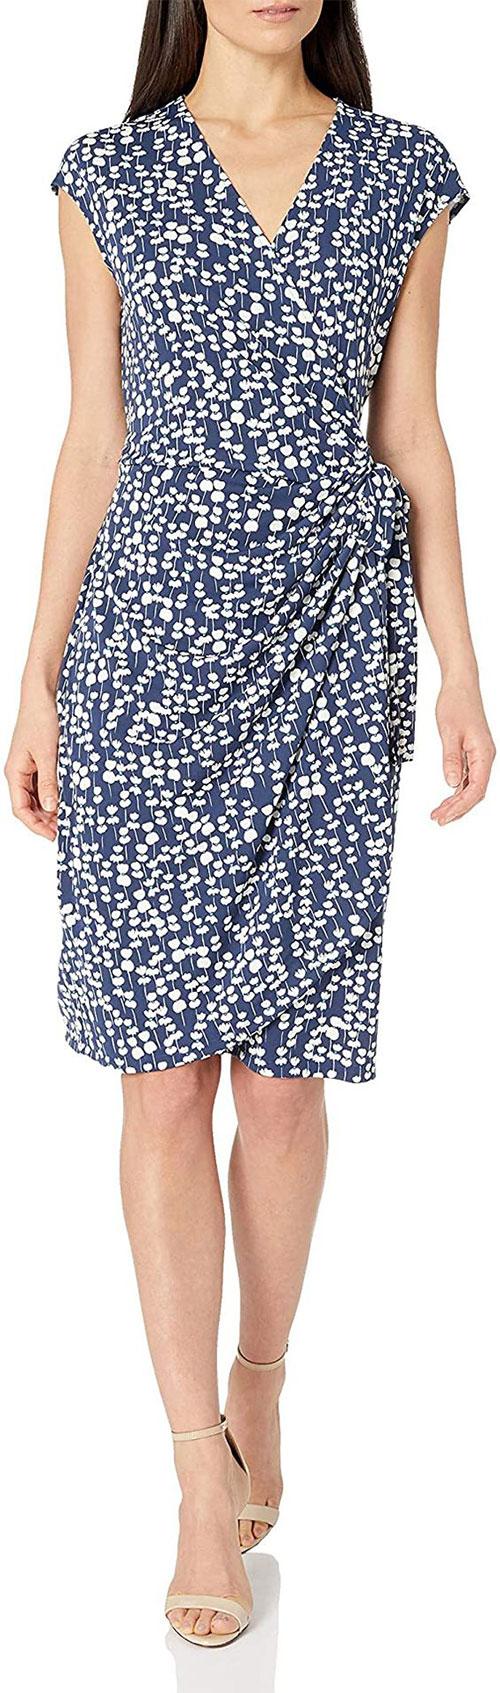 Spring-Dresses-For-Girls-Women-2020-Spring-Fashion-9